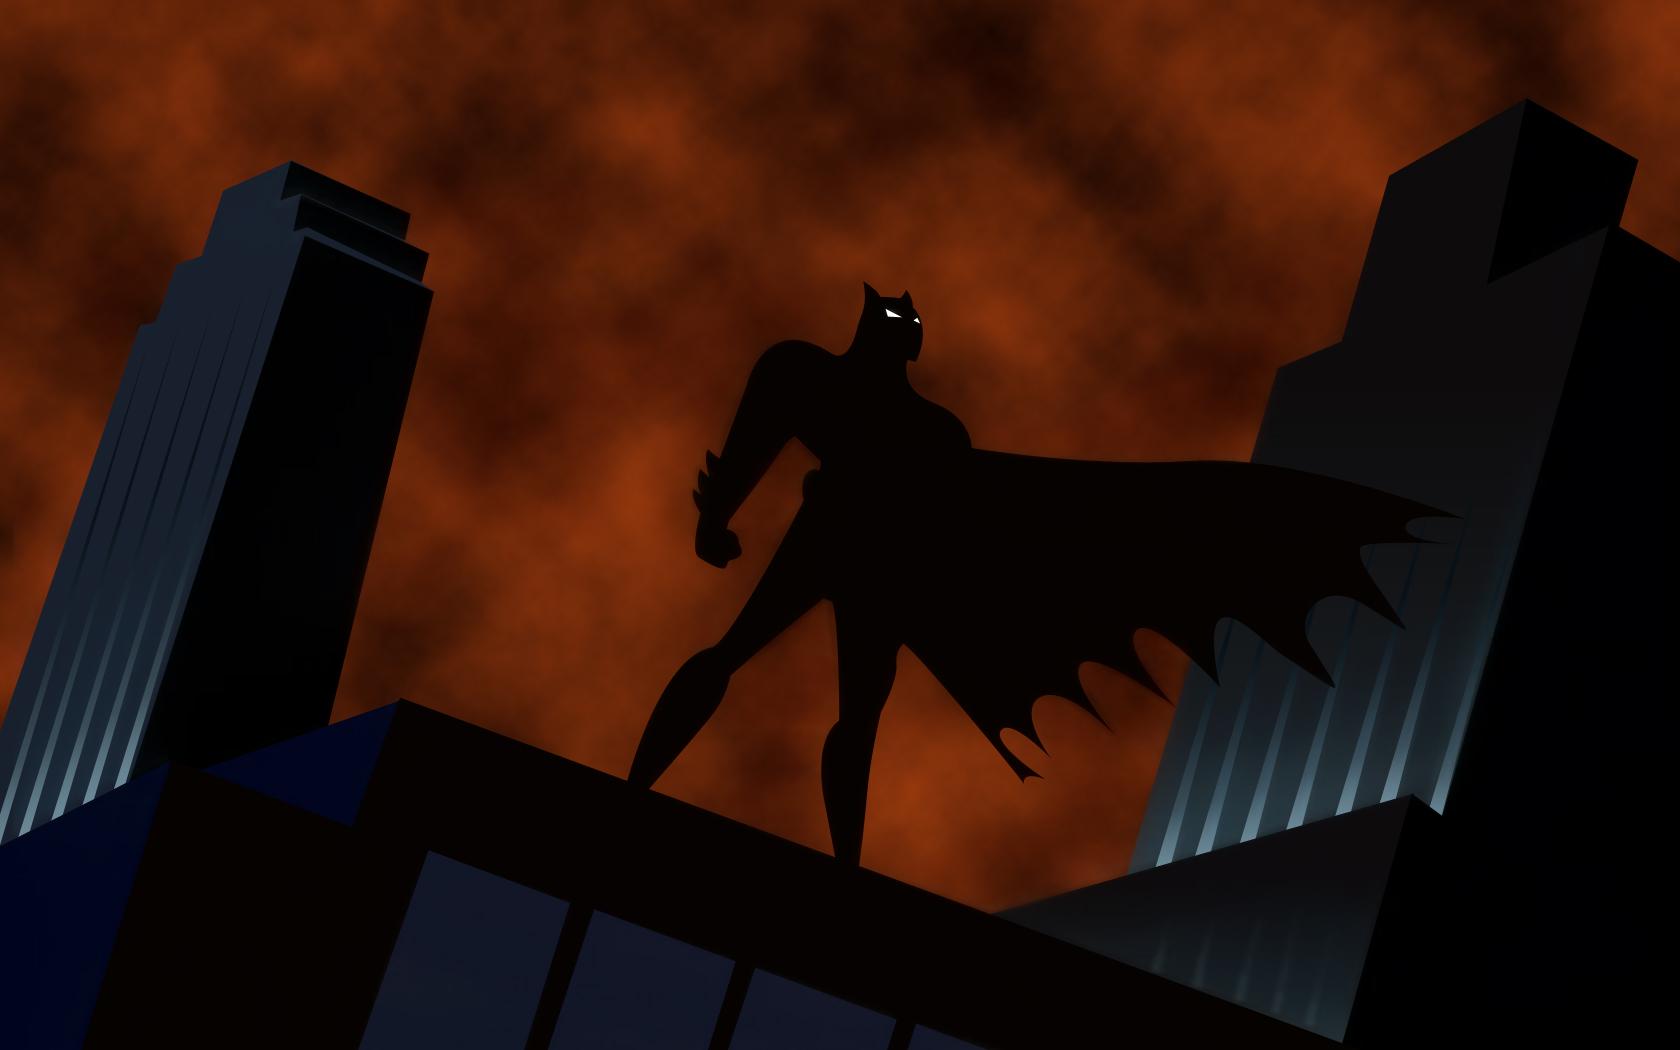 Kevin Conroy Vuelve A Criticar Batman V Superman Y A Opinar Sobre